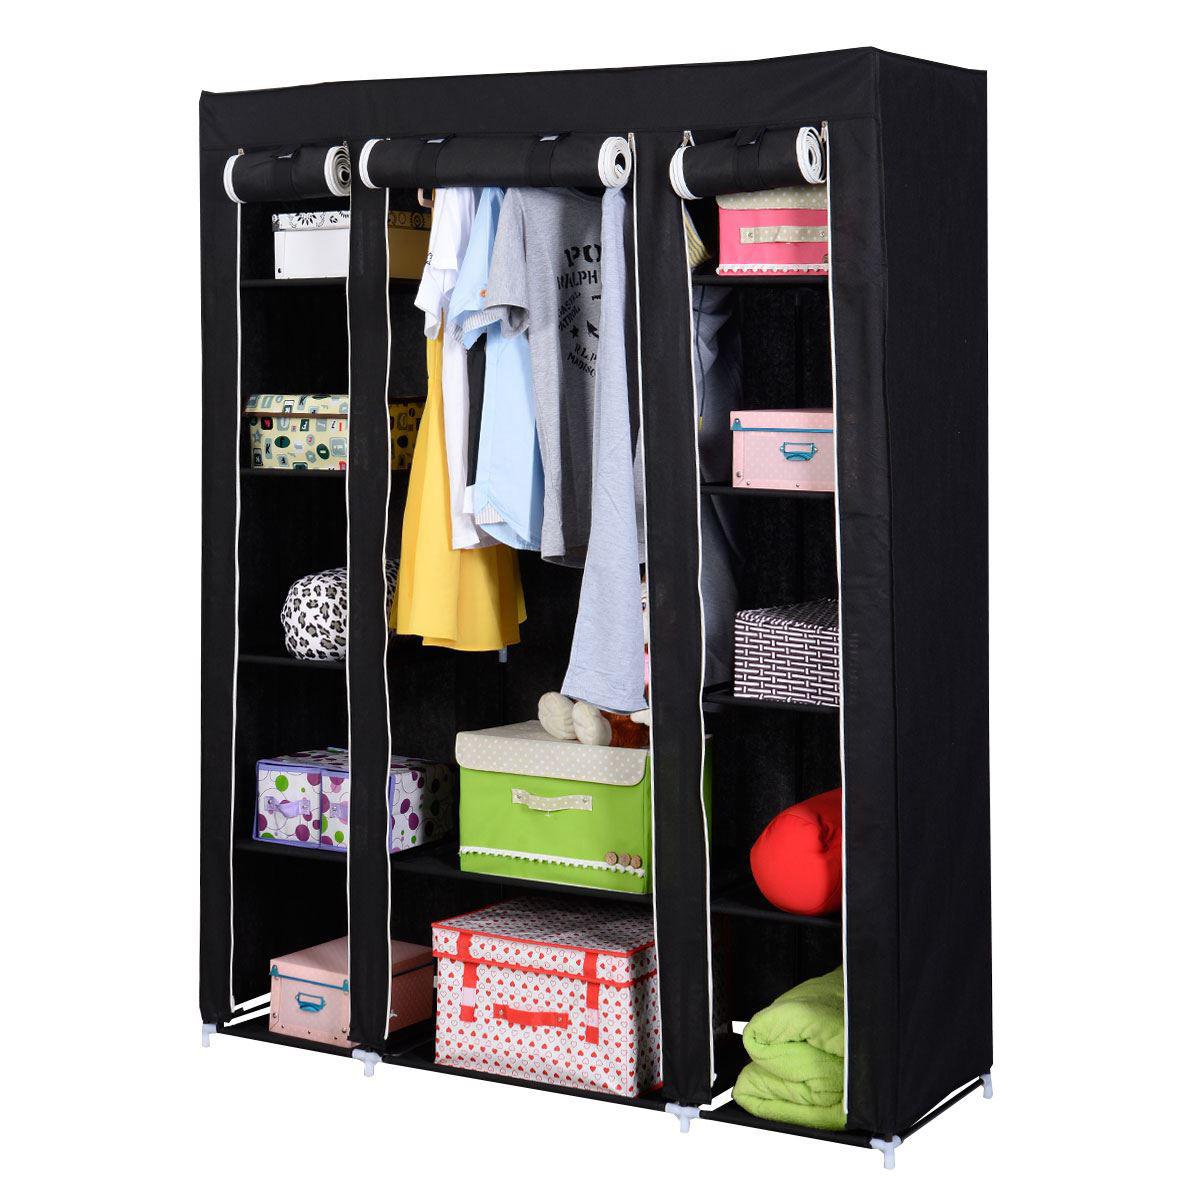 Picture of Portable Clothes Shoes Storage - Black